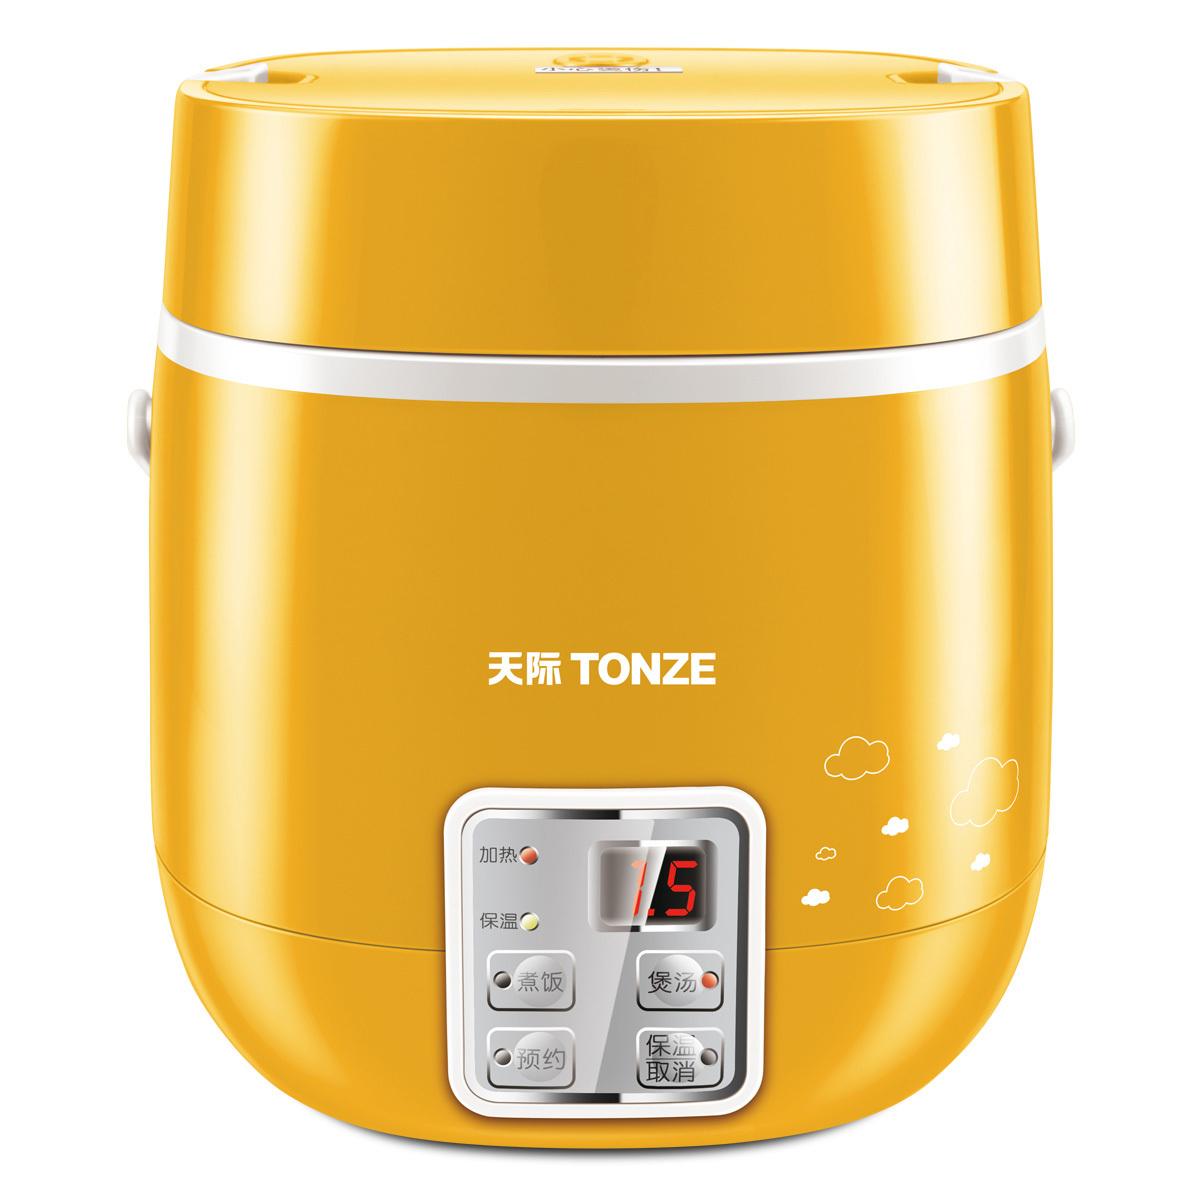 Tonze/天际 FD10B-W电饭煲好用吗,哪款值得买呢